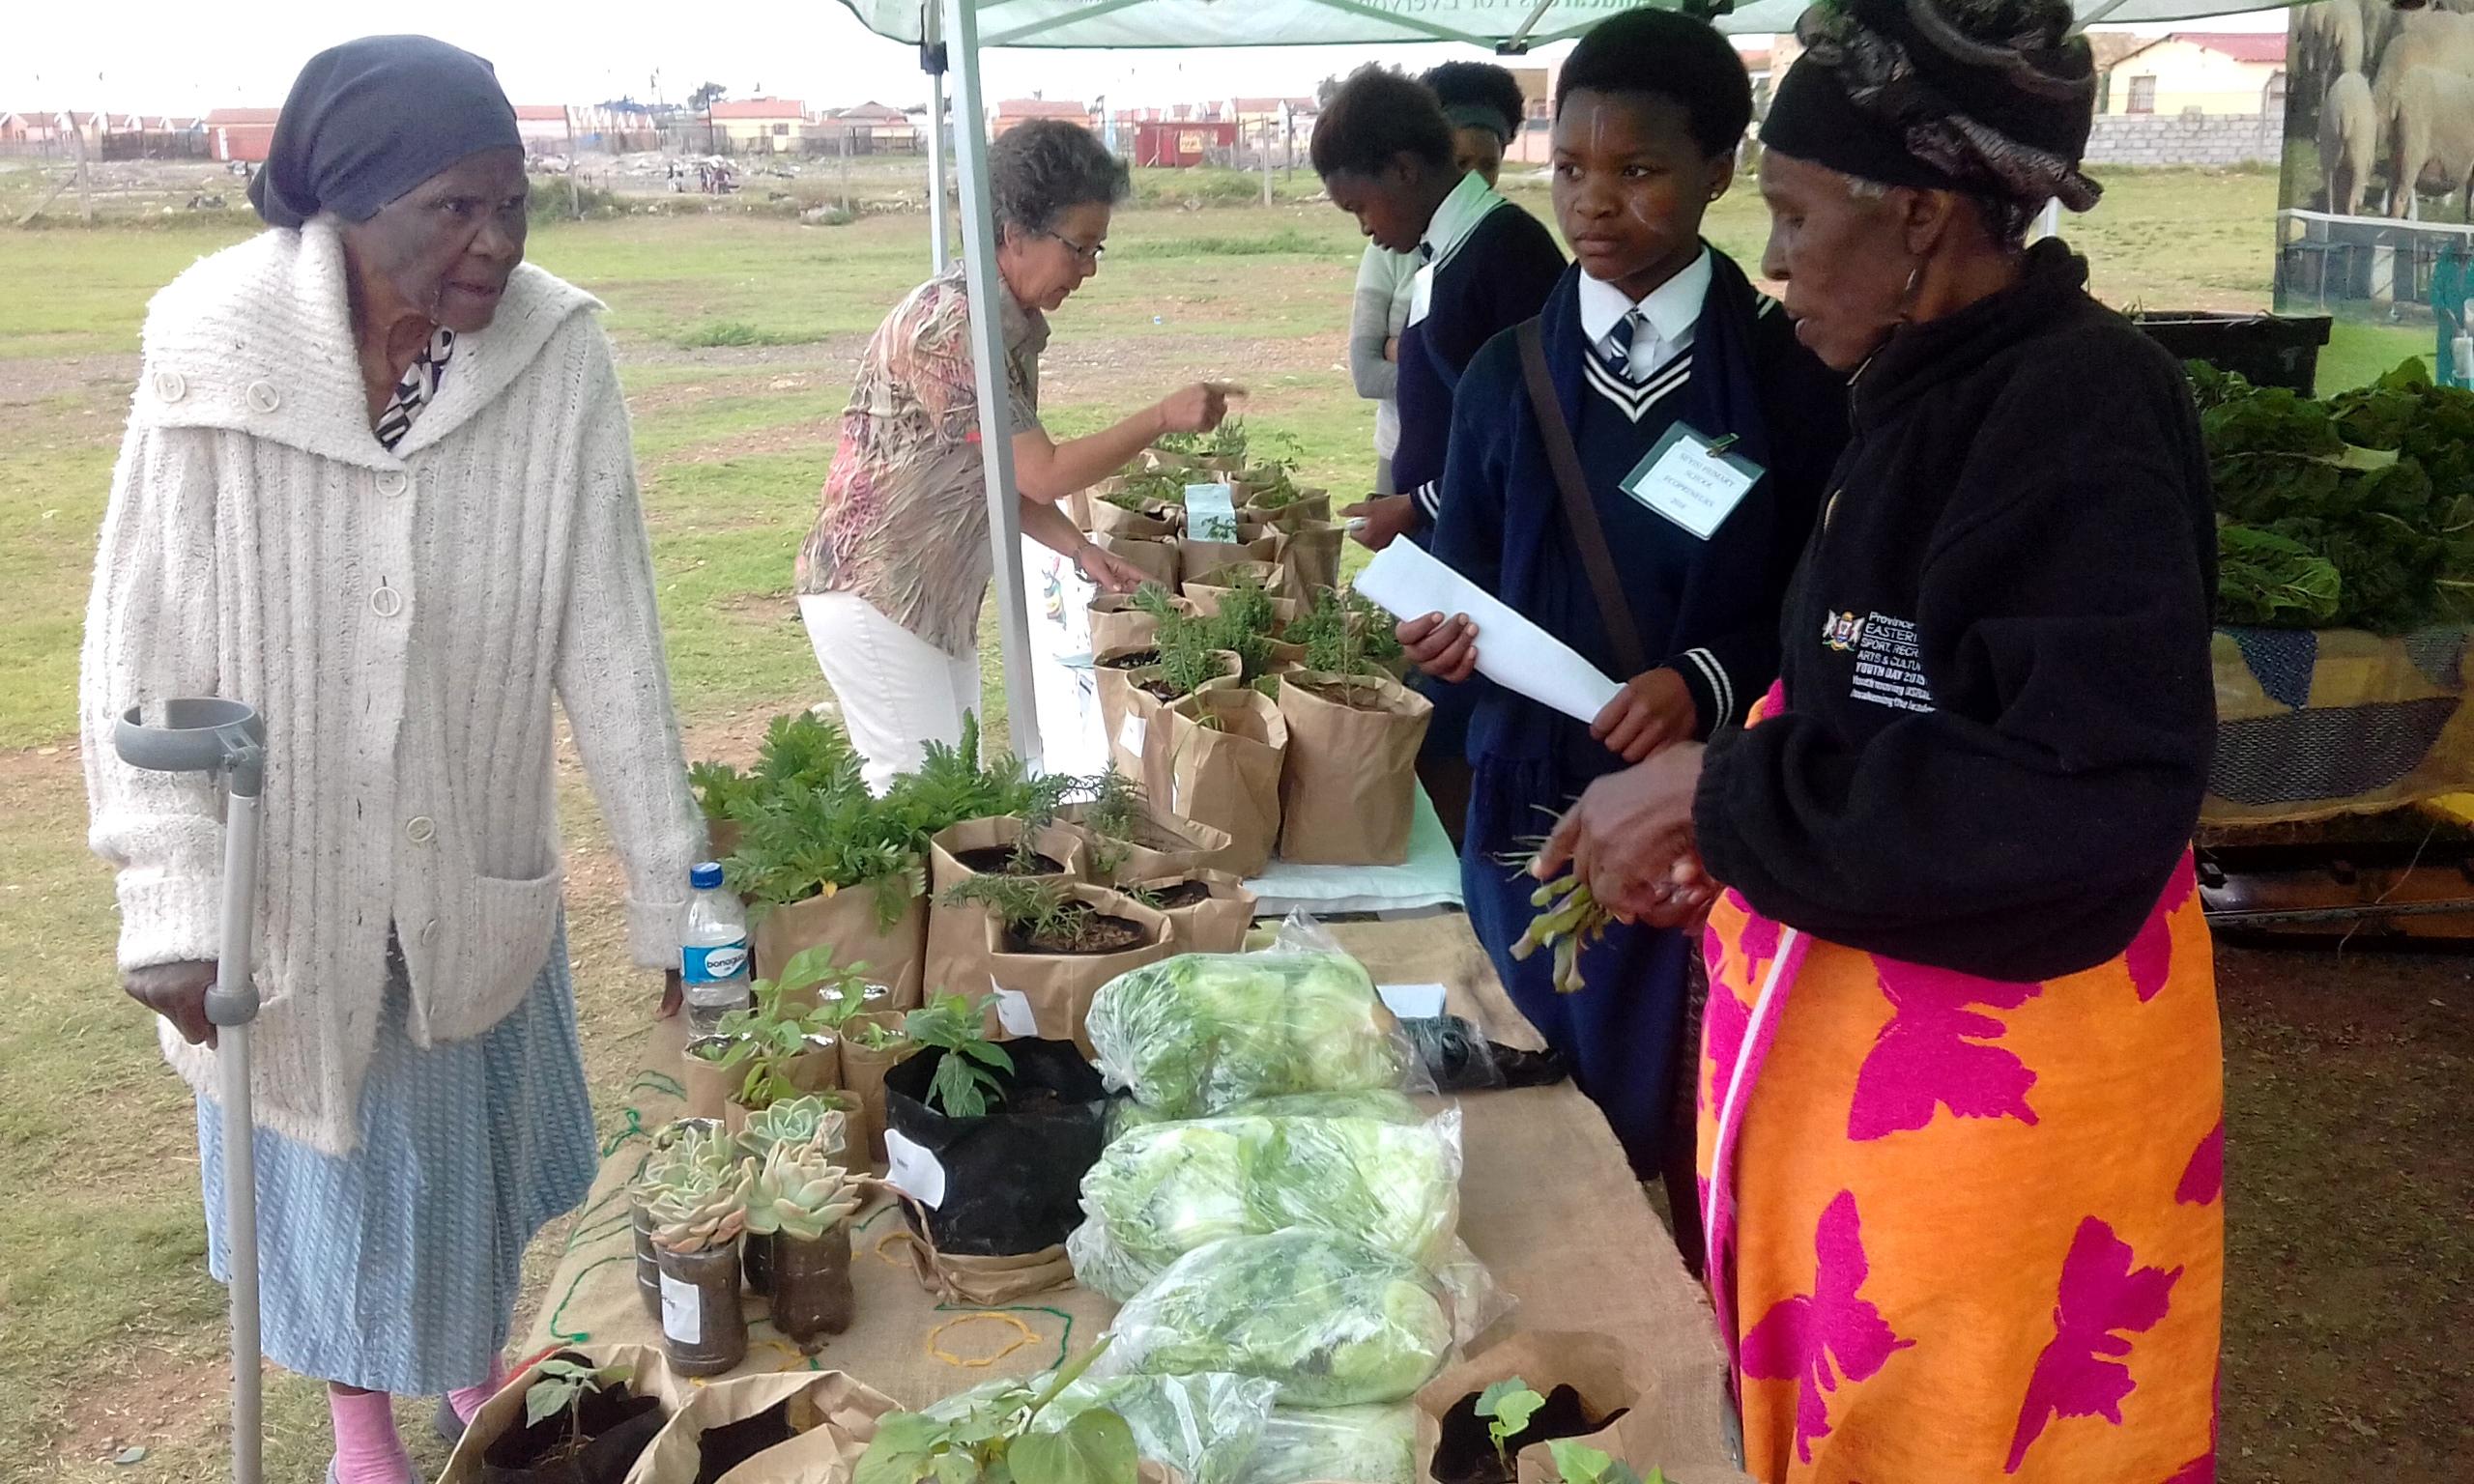 School vegetable gardens - Photo Of A Vegetable Market